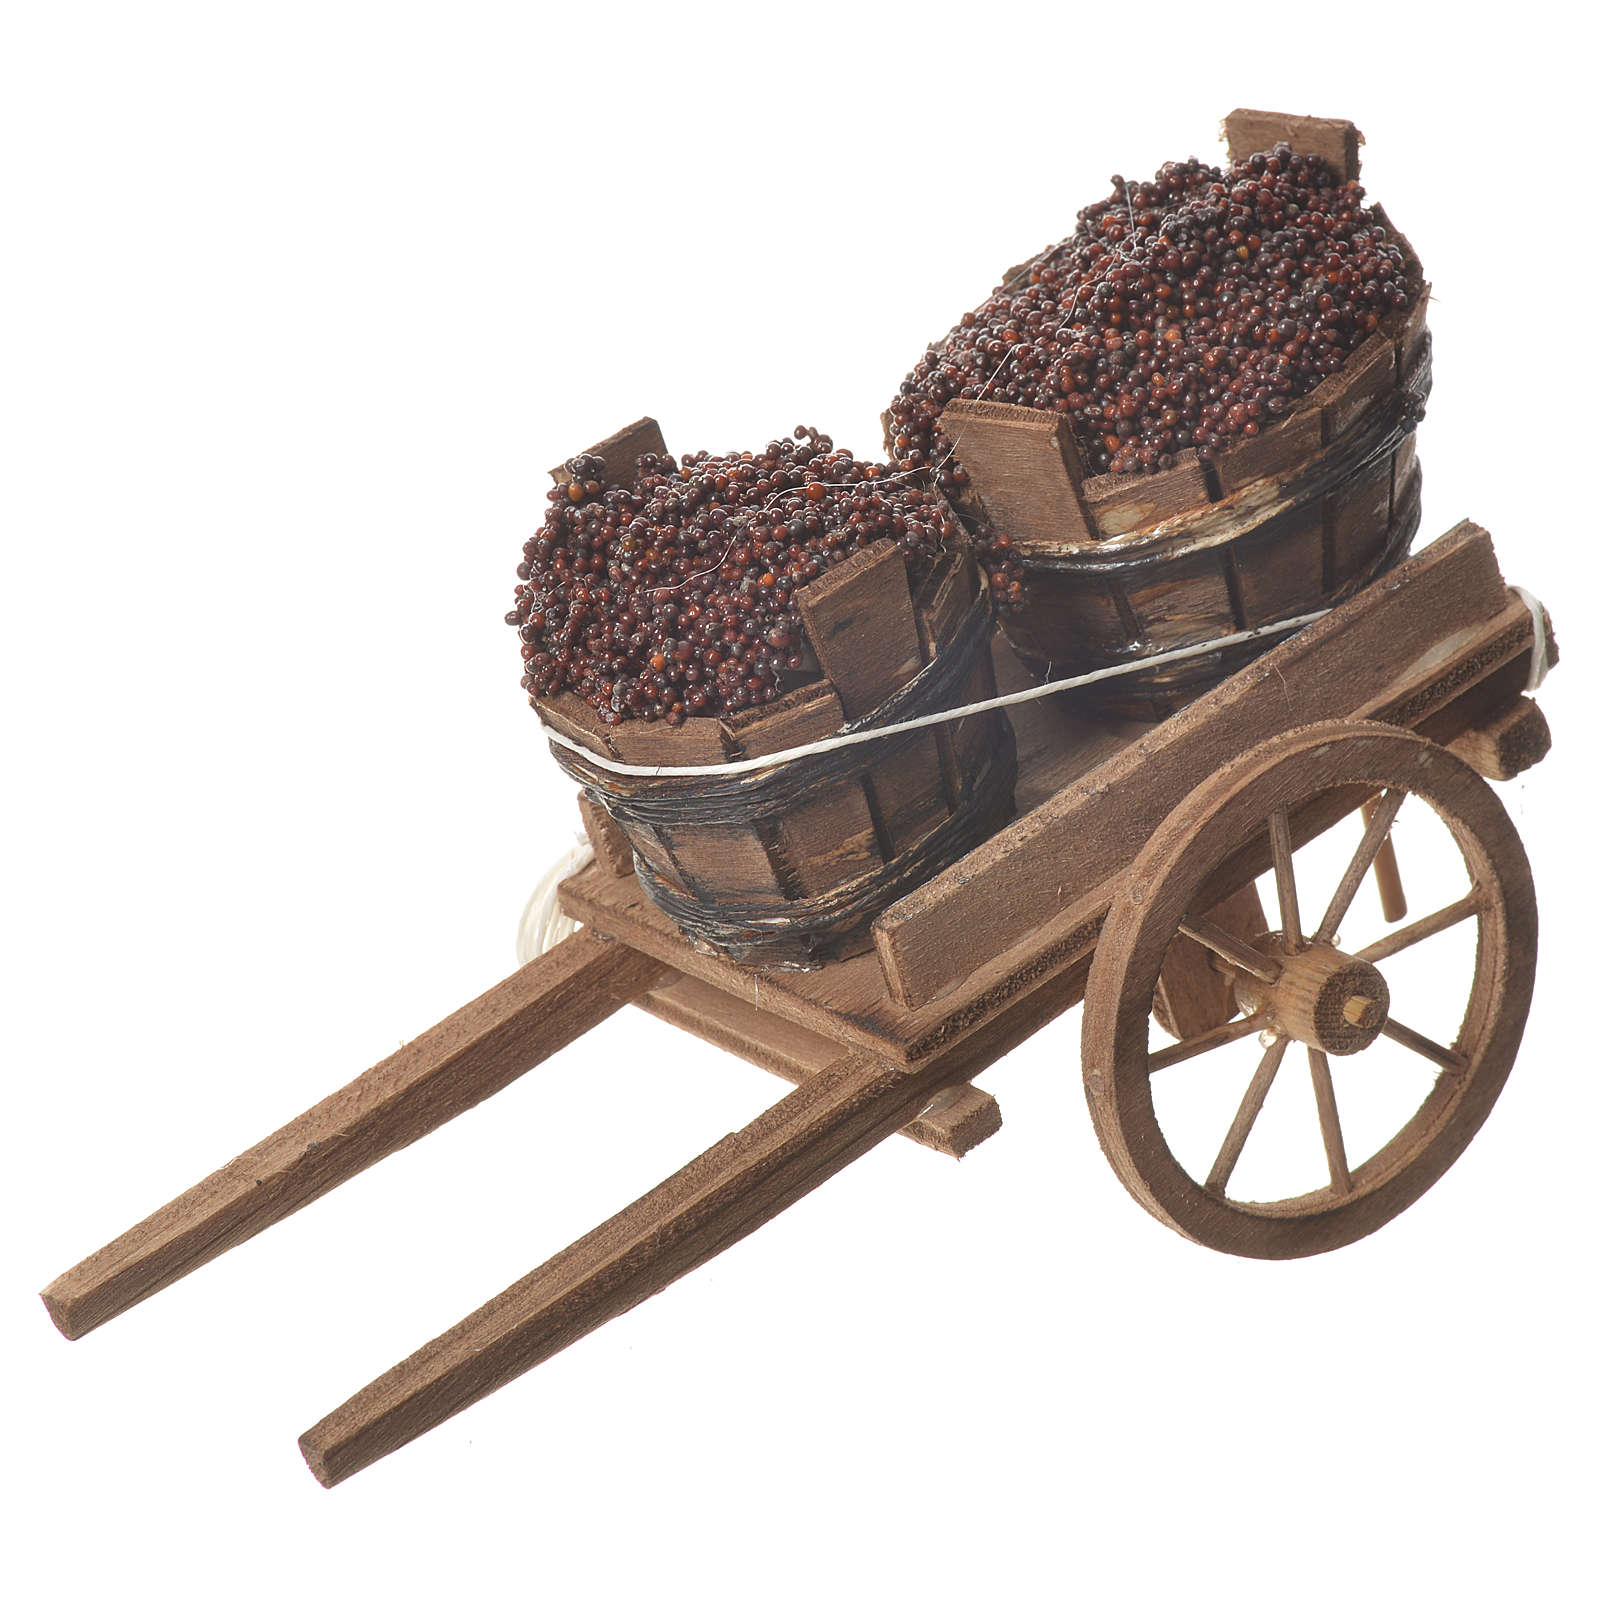 Cart with tubs, Neapolitan nativity 18x6cm 4